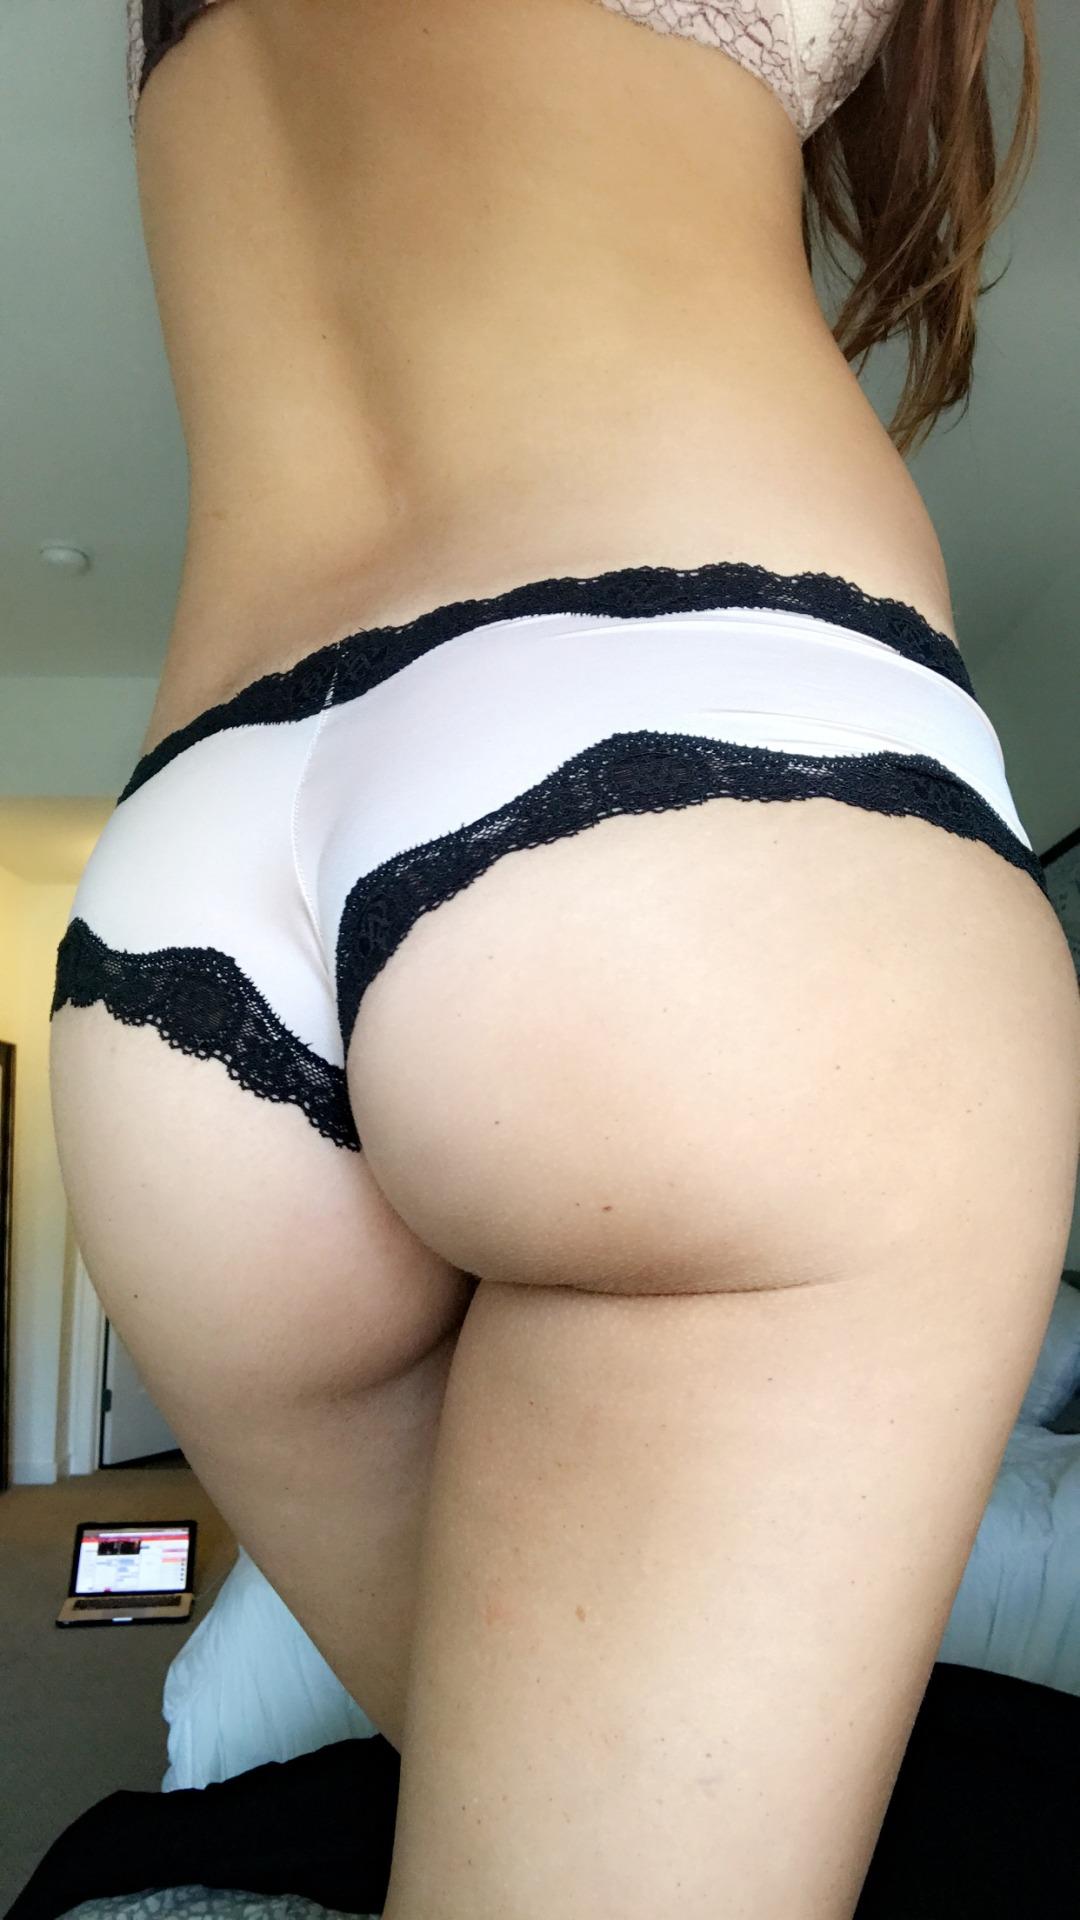 SassyyGingers' sweet cheeks